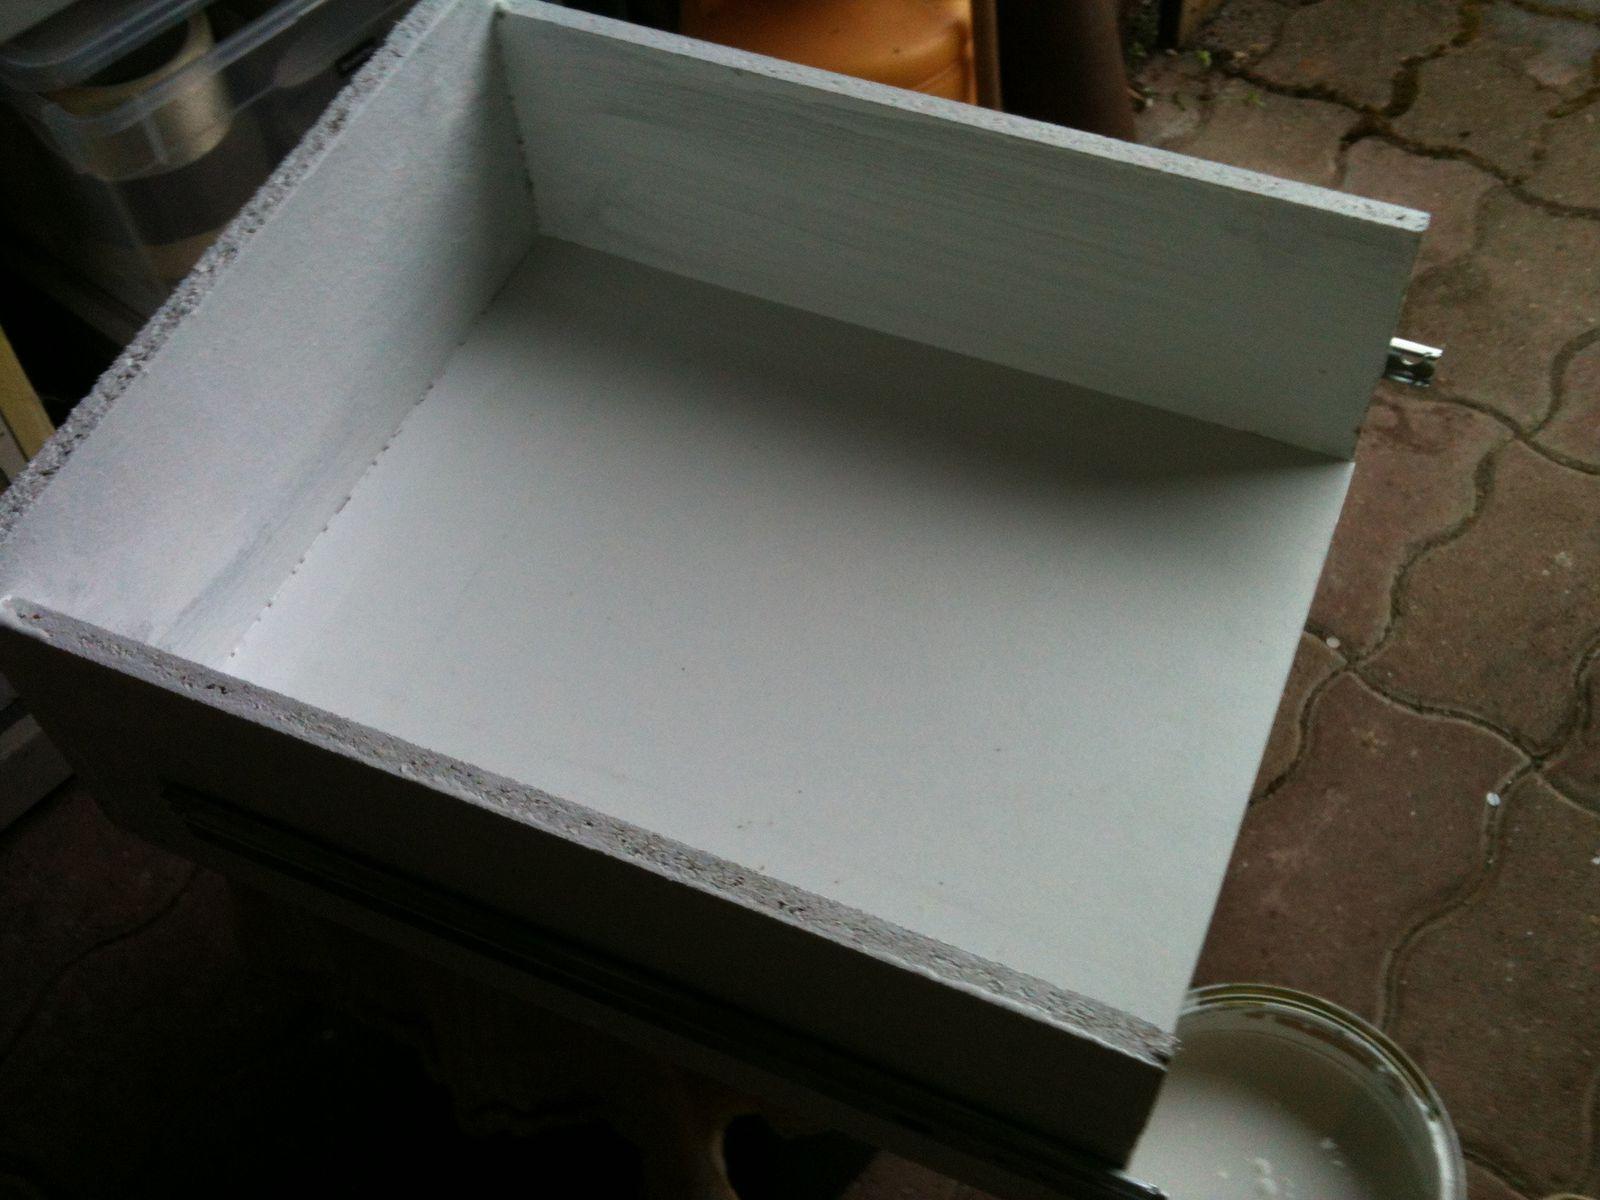 meuble haut cuisine ikea fixation meuble classeur ikea le de juliette avril fauteuil with tiroir. Black Bedroom Furniture Sets. Home Design Ideas